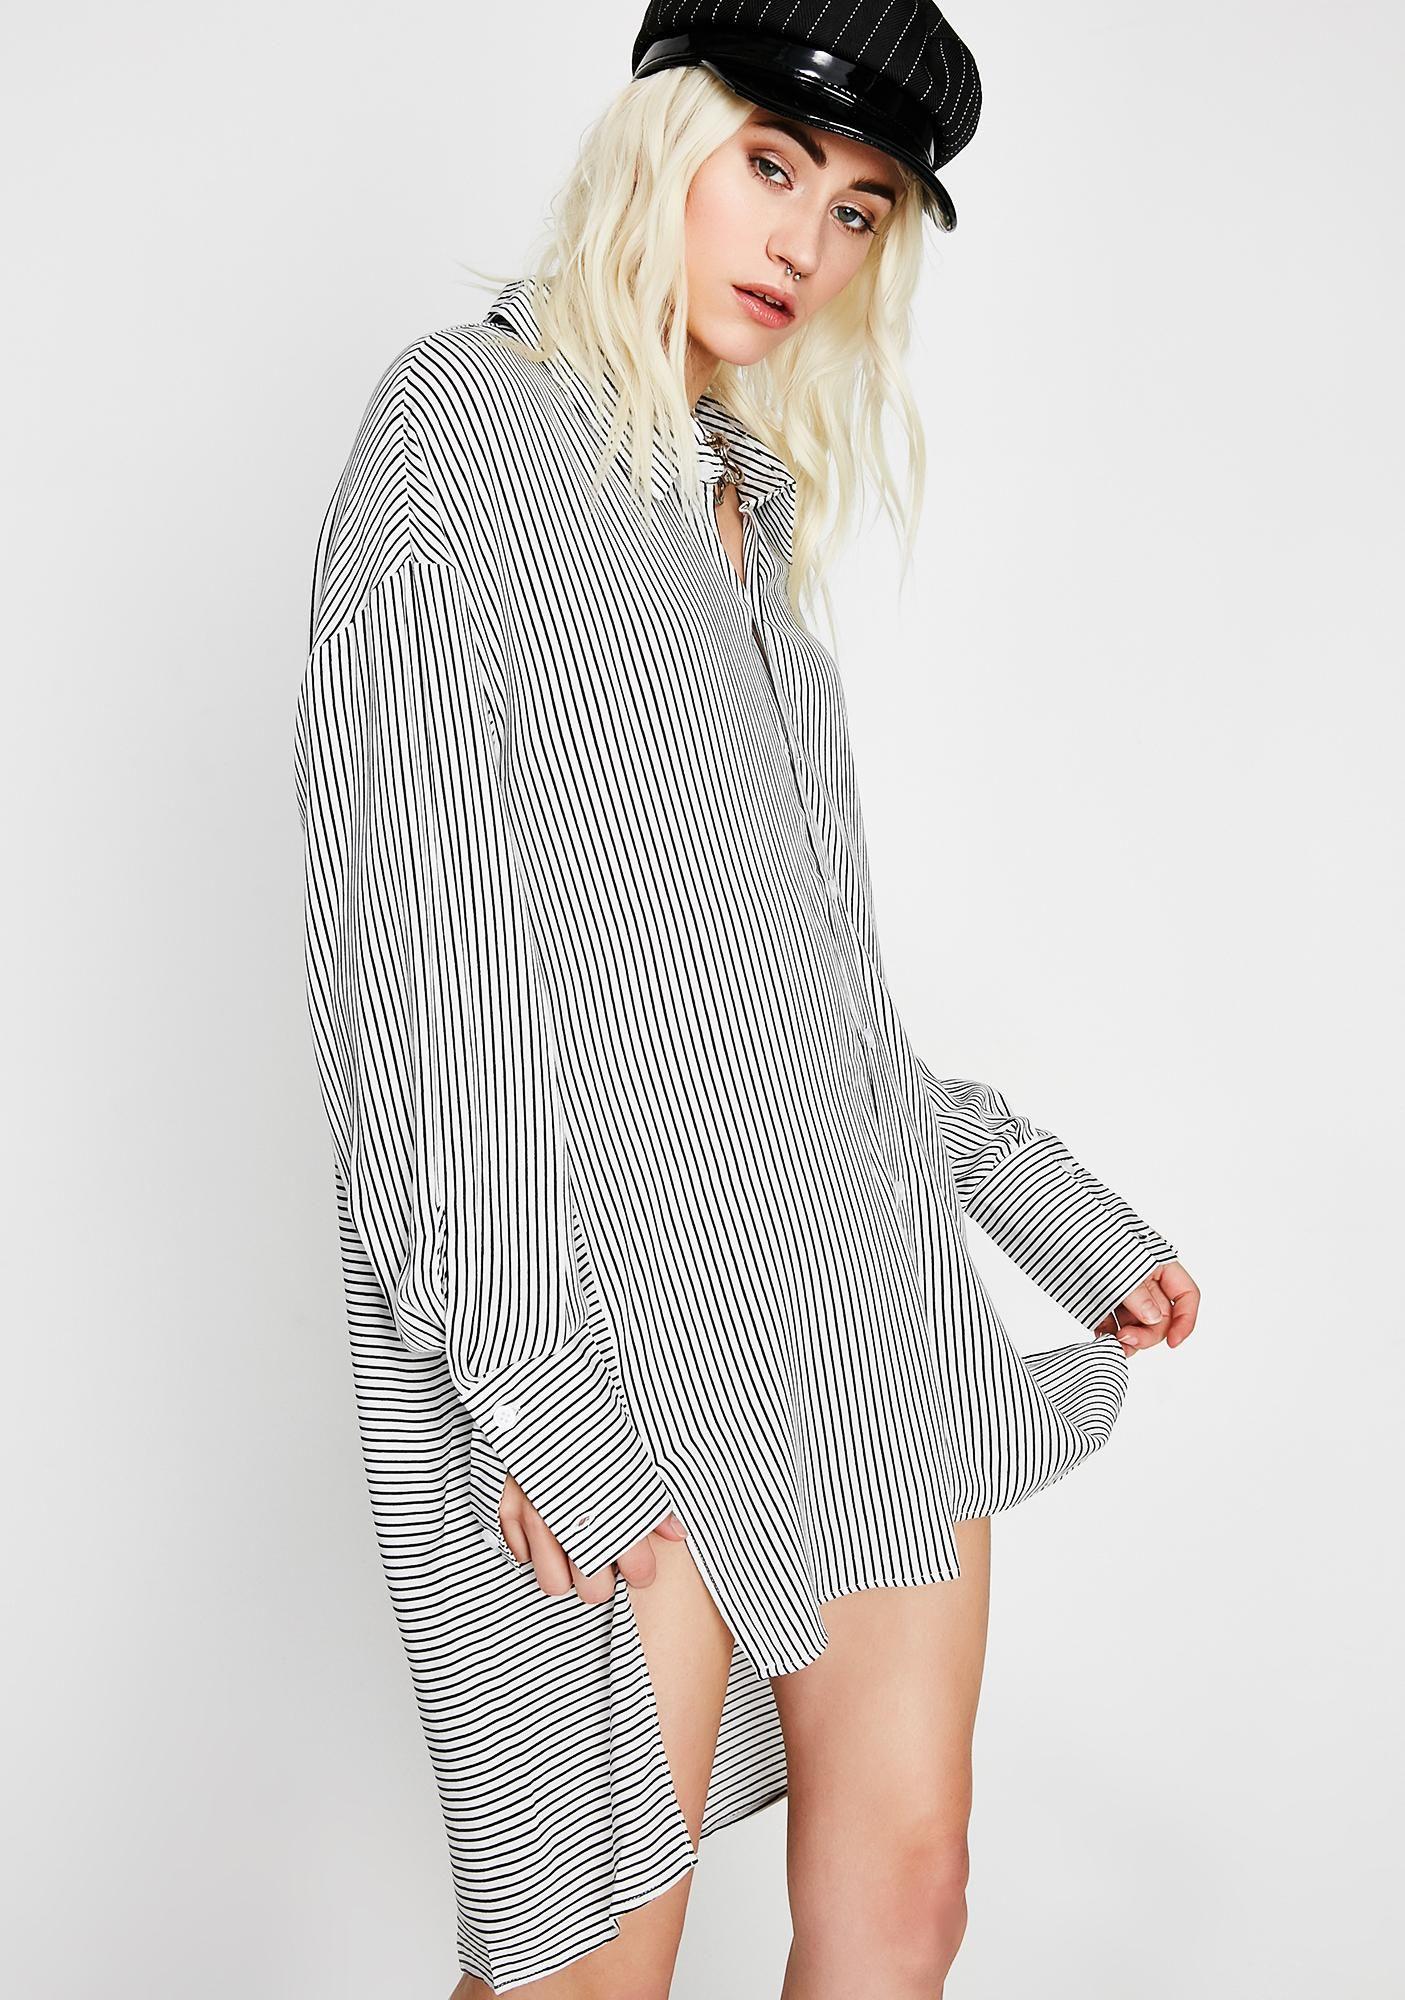 Know It All Stripe Shirt   Women's Fashion   Shirts, Fashion